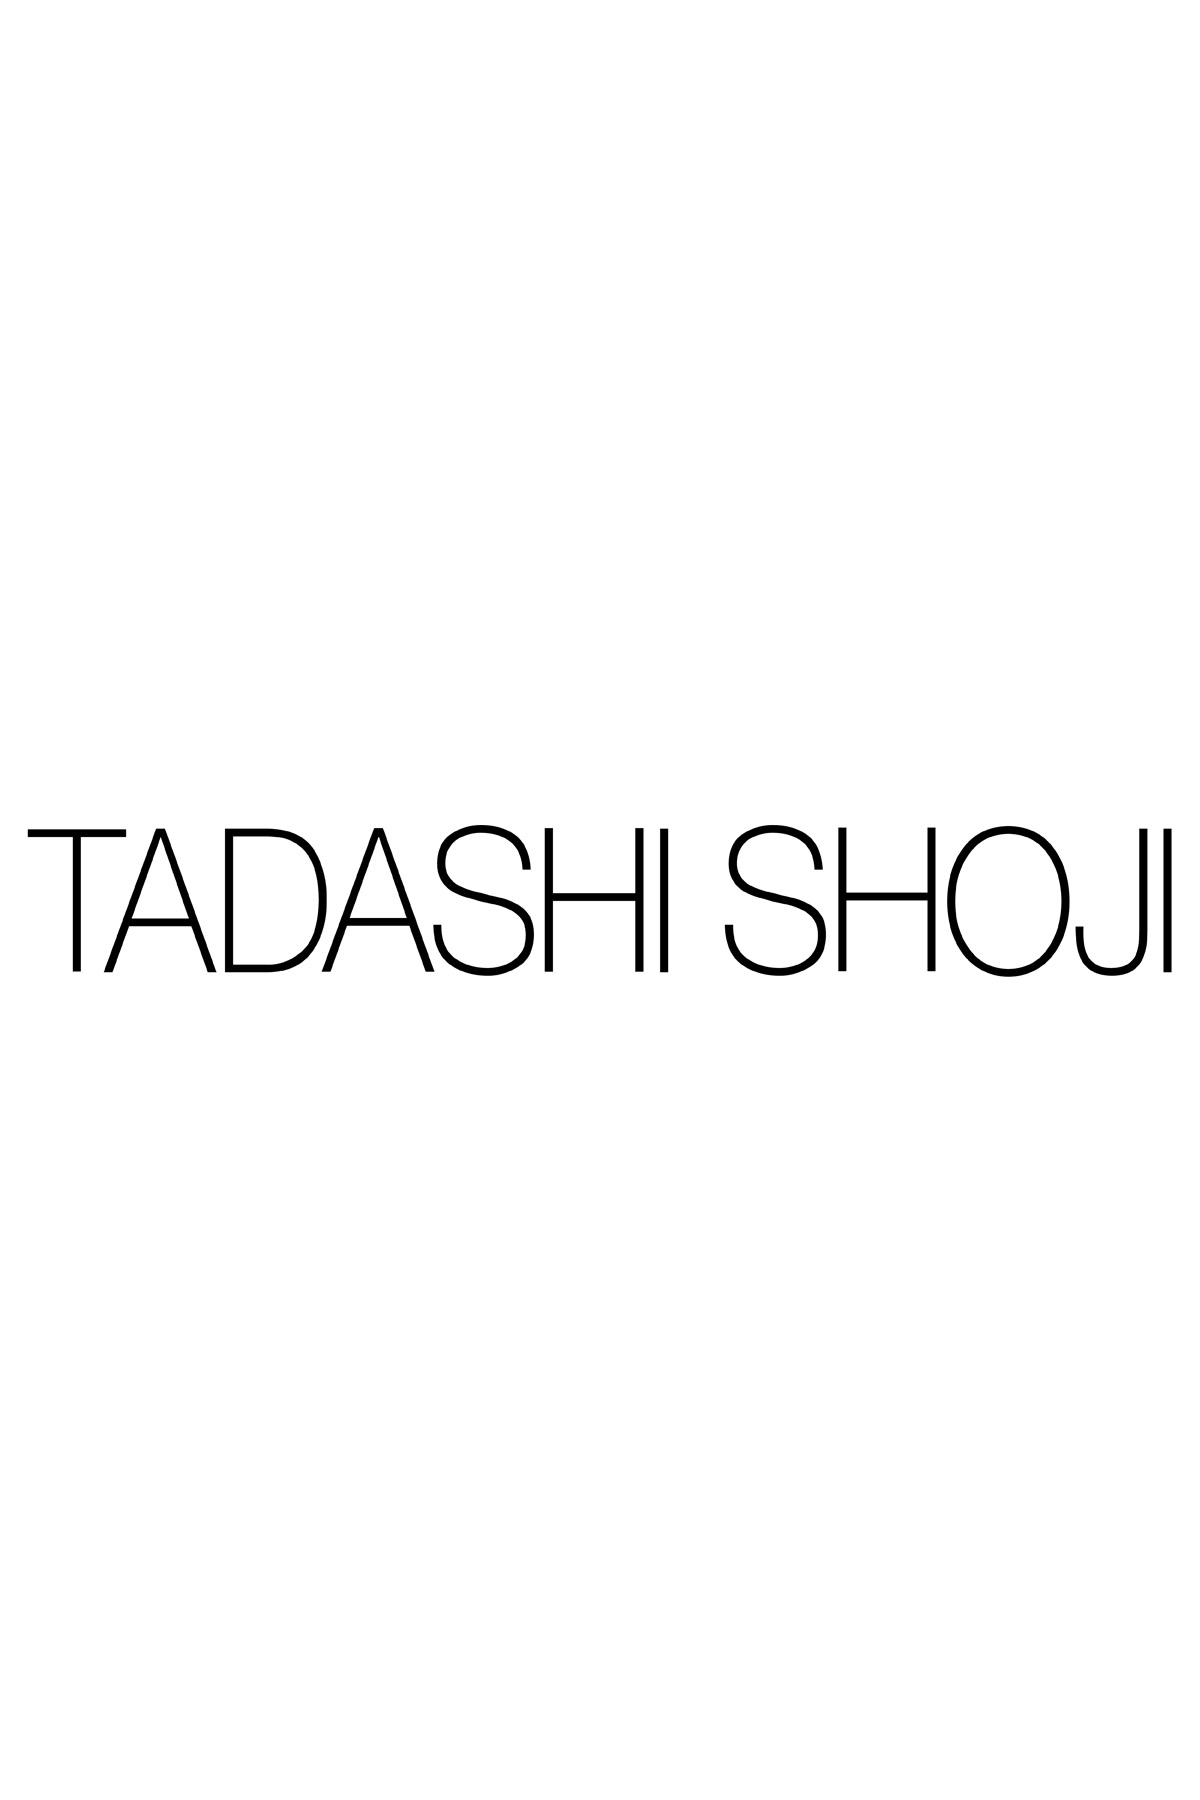 2be720f9d845 Women's Plus Size Evening Gowns & Formal Dresses | Tadashi Shoji